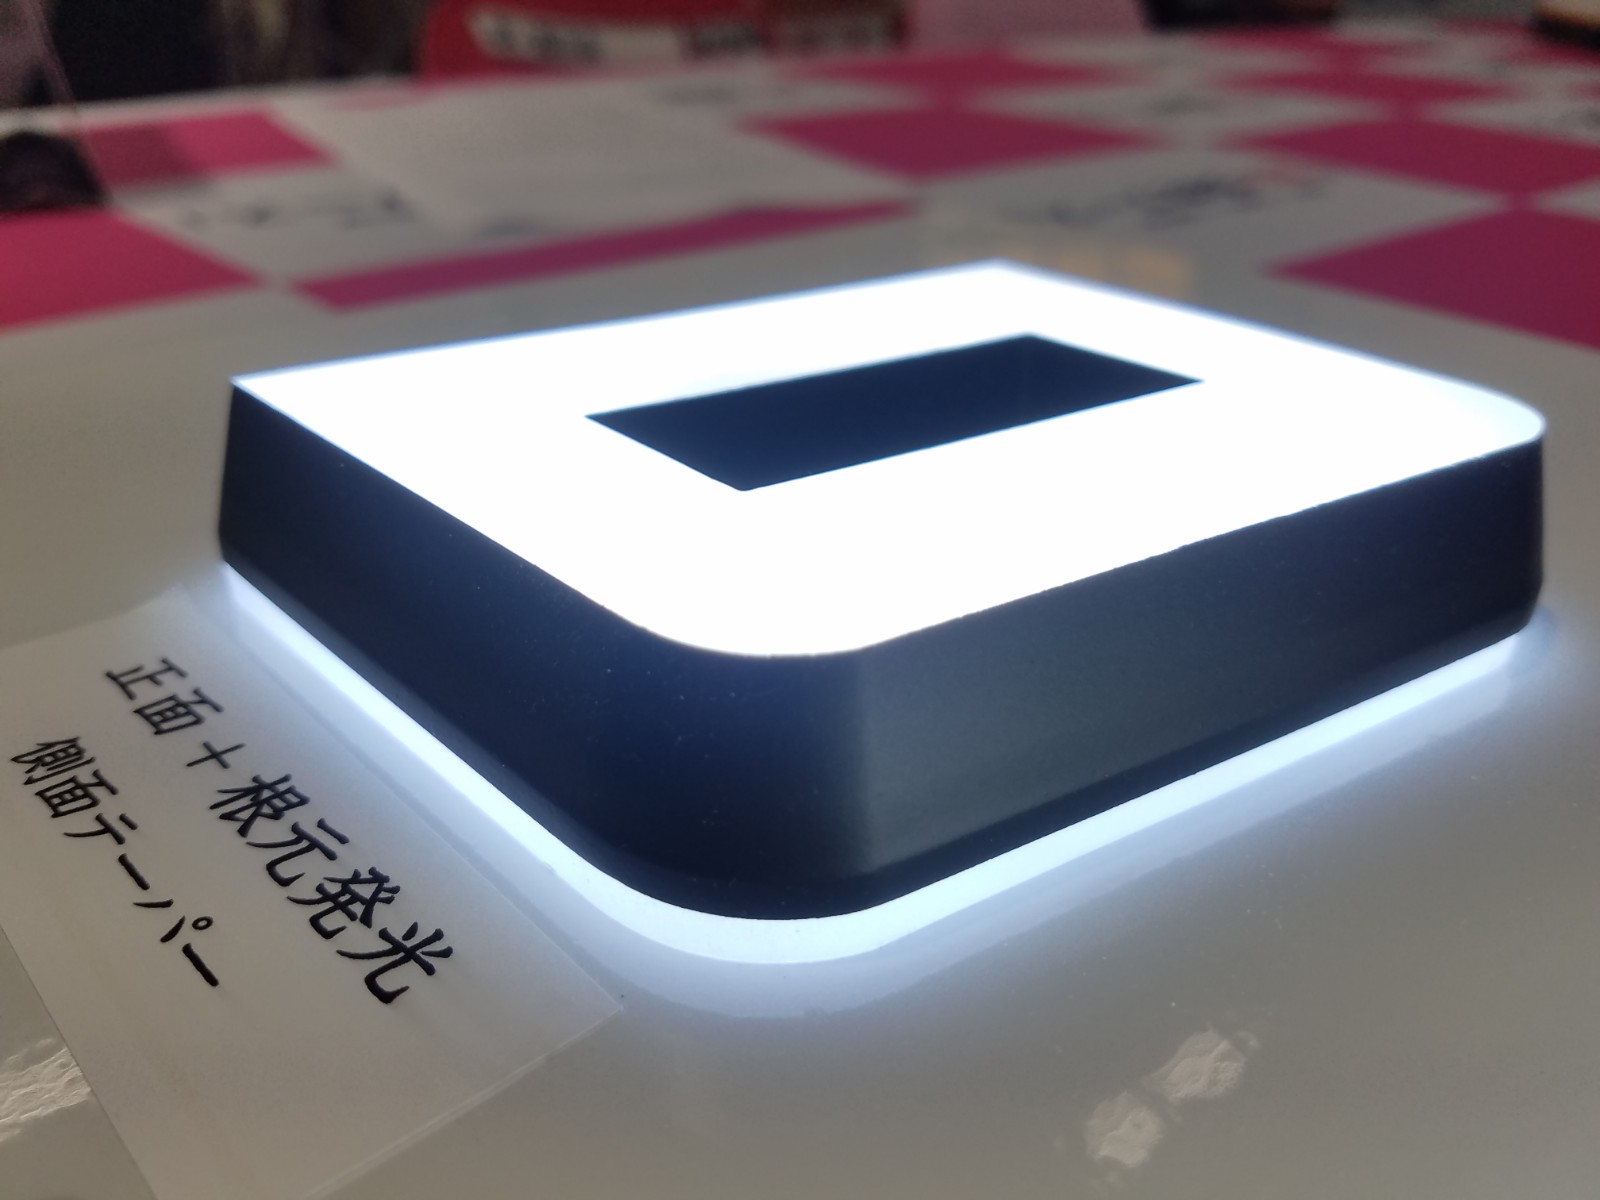 LEDサイン 全面発光 AllLit 正面+根元発光 DELIGHT